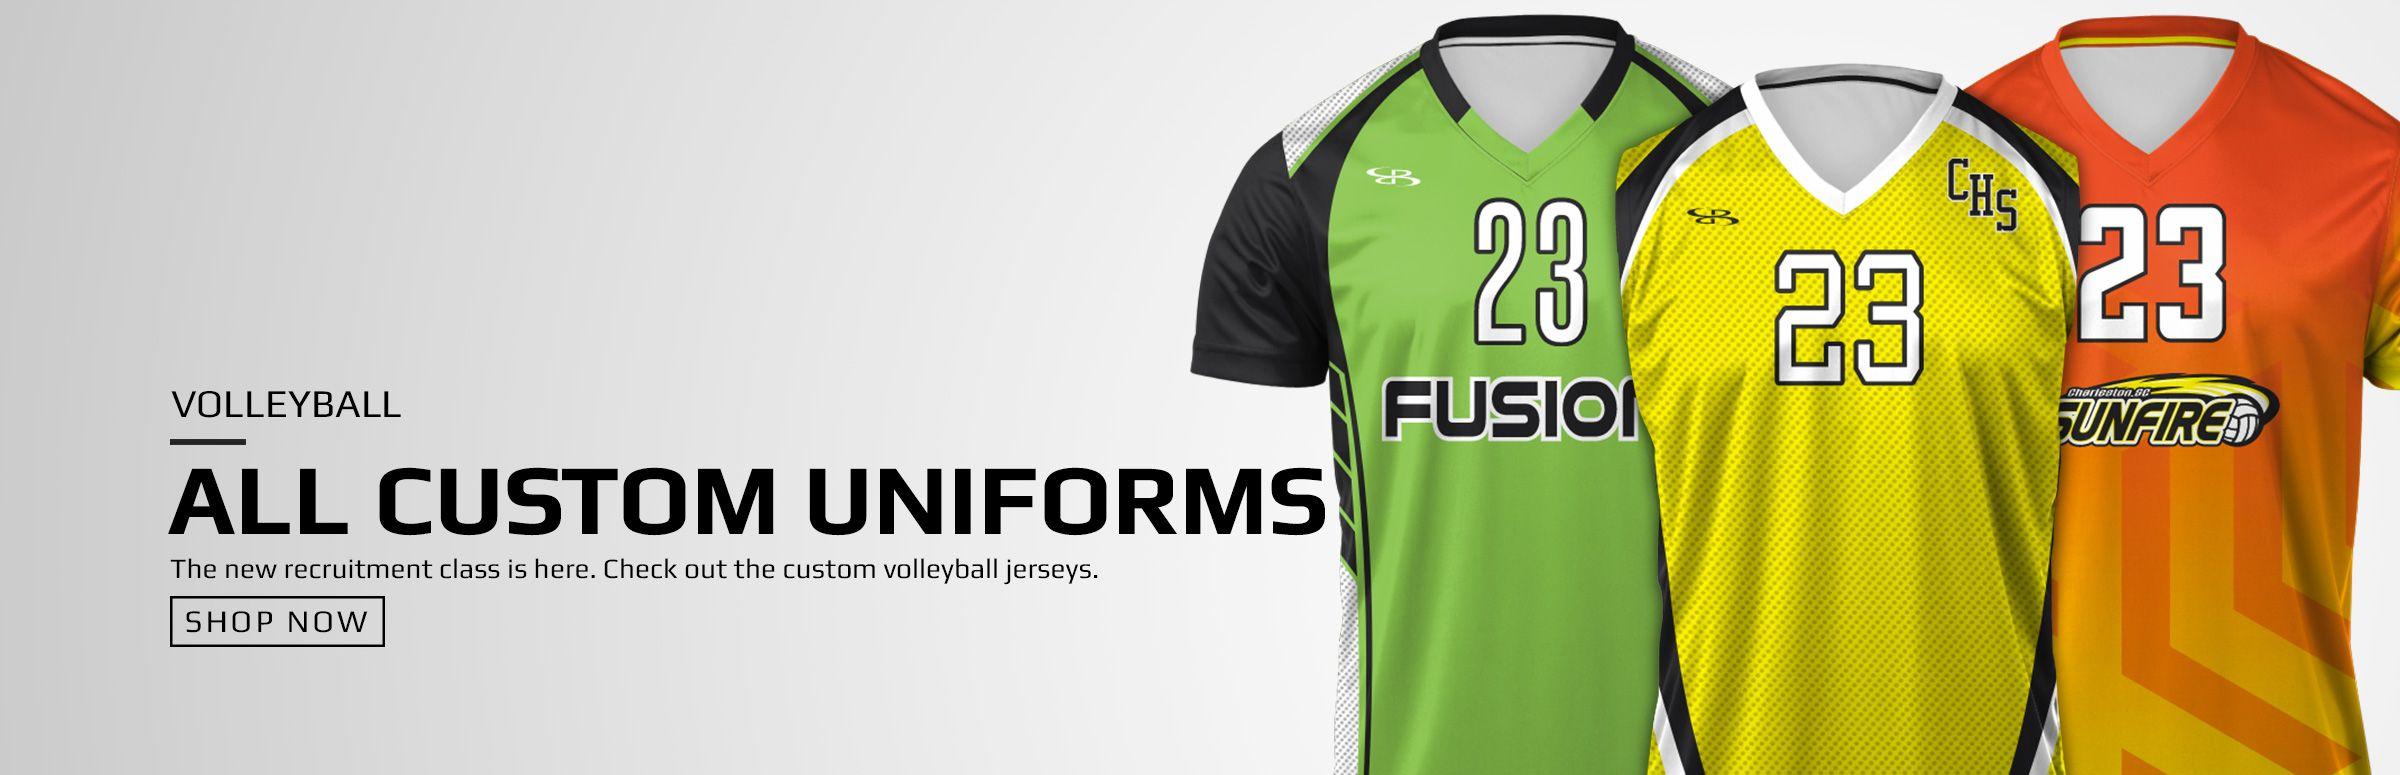 Boombah Custom Volleyball Uniforms